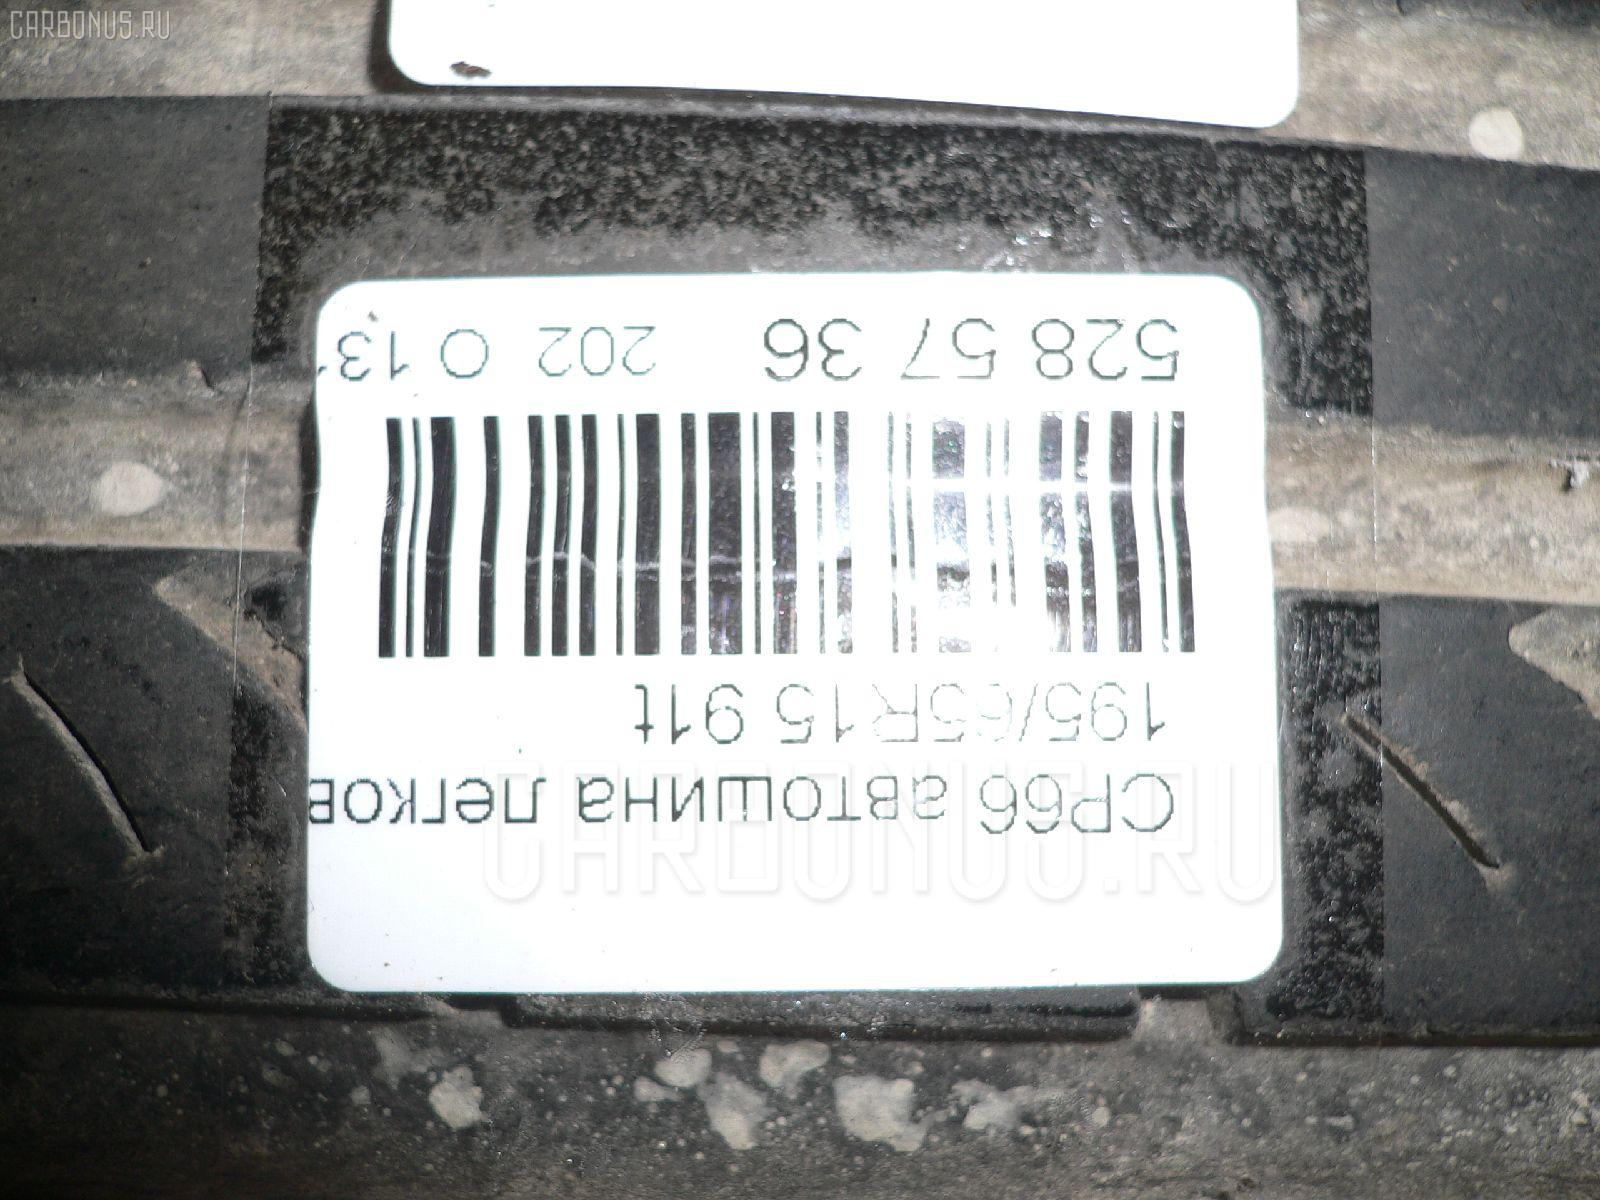 Автошина легковая летняя CP661 195/65R15 NEXEN Фото 2